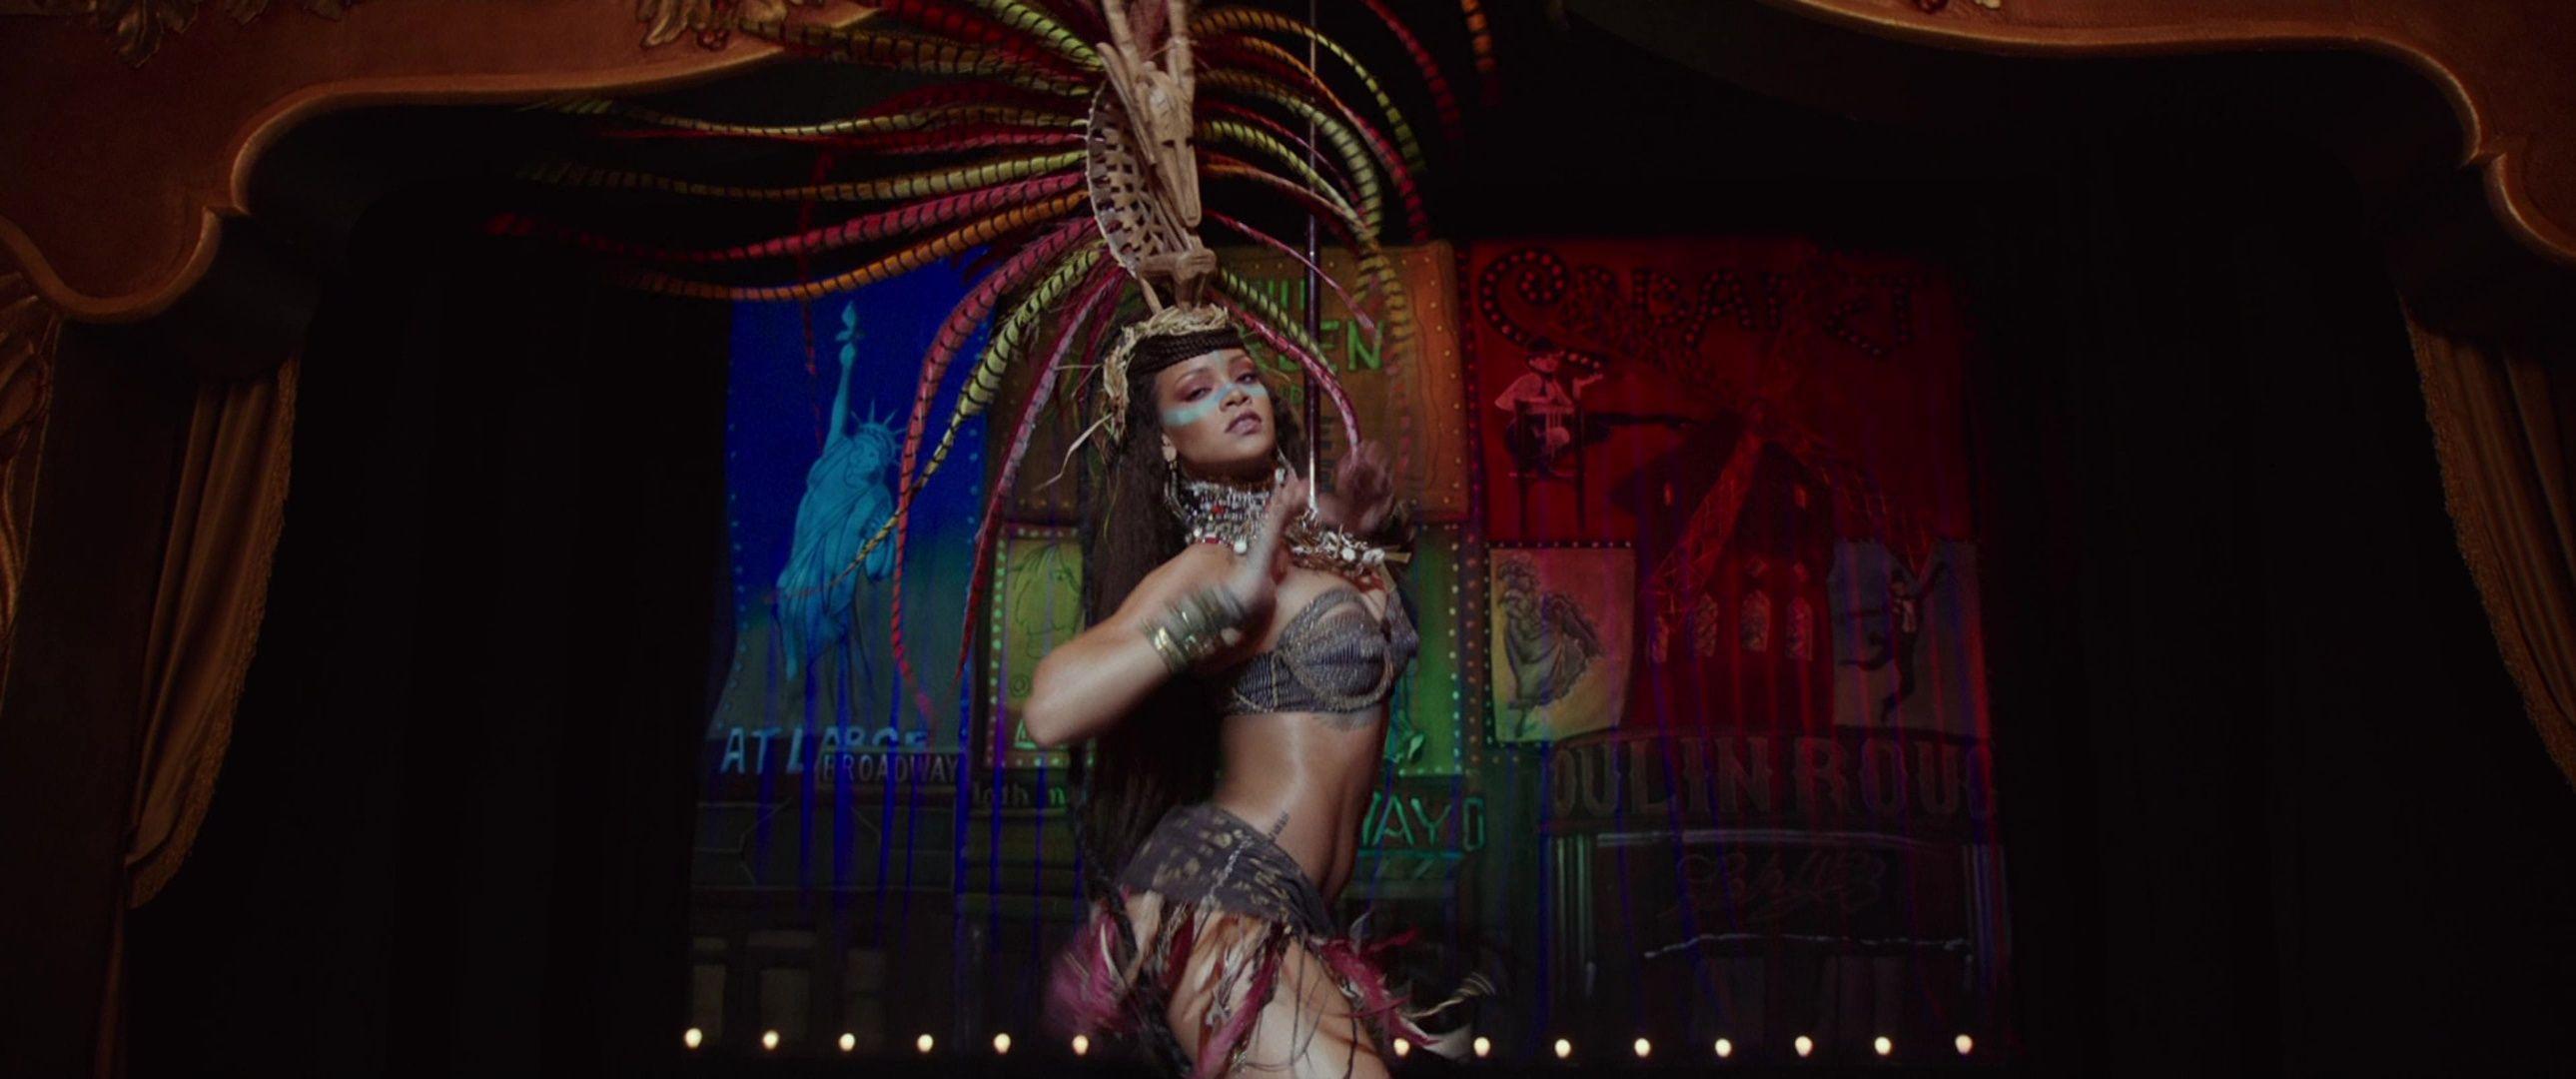 Rihanna-Sexy-31-thefappeningblog.com_.jpg